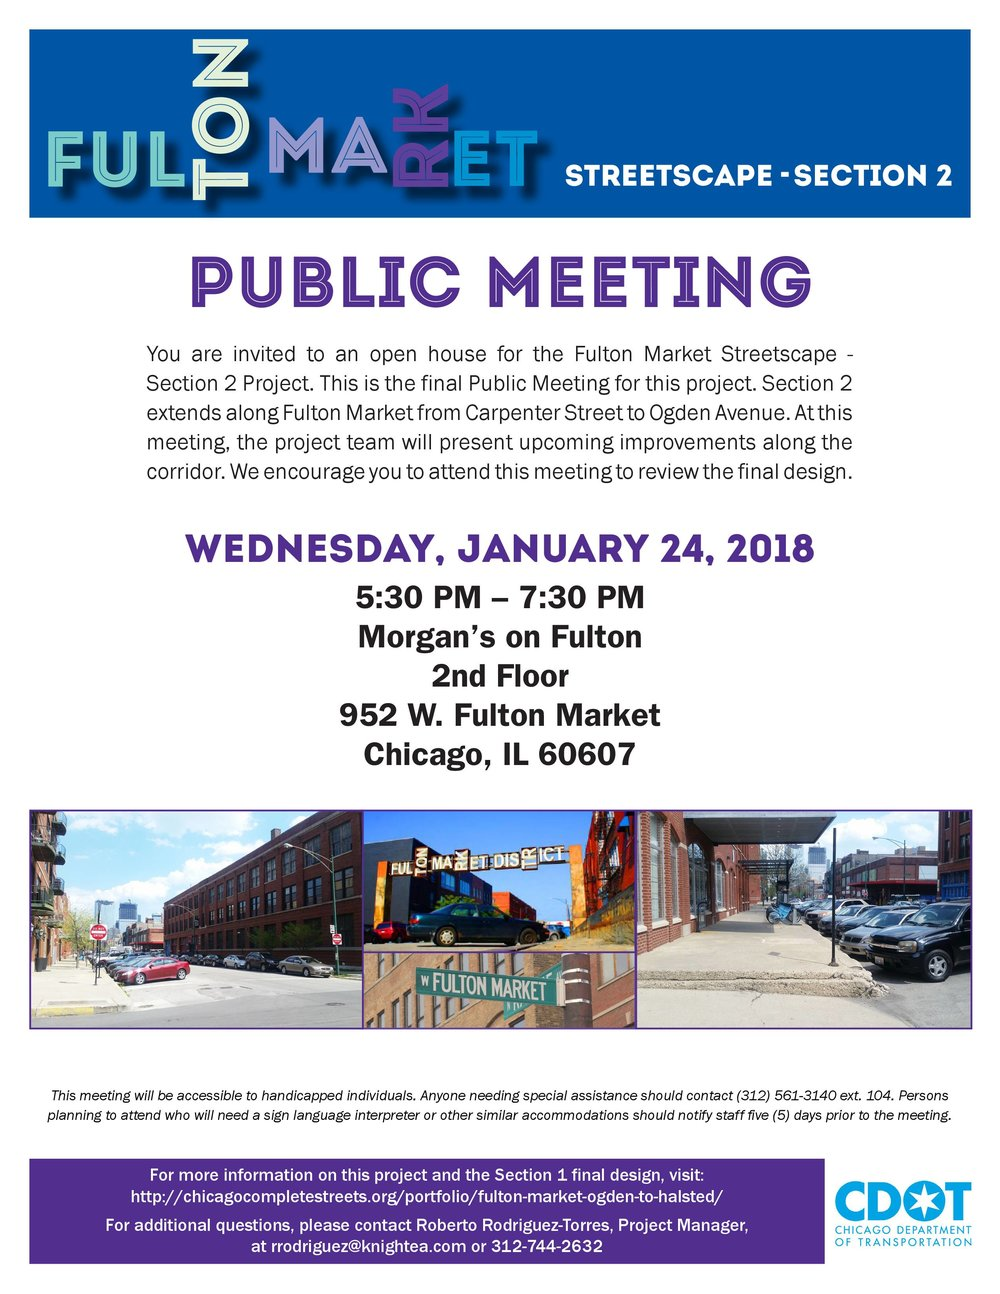 Fulton Market Section 2 - Public Meeting Flyer.jpg